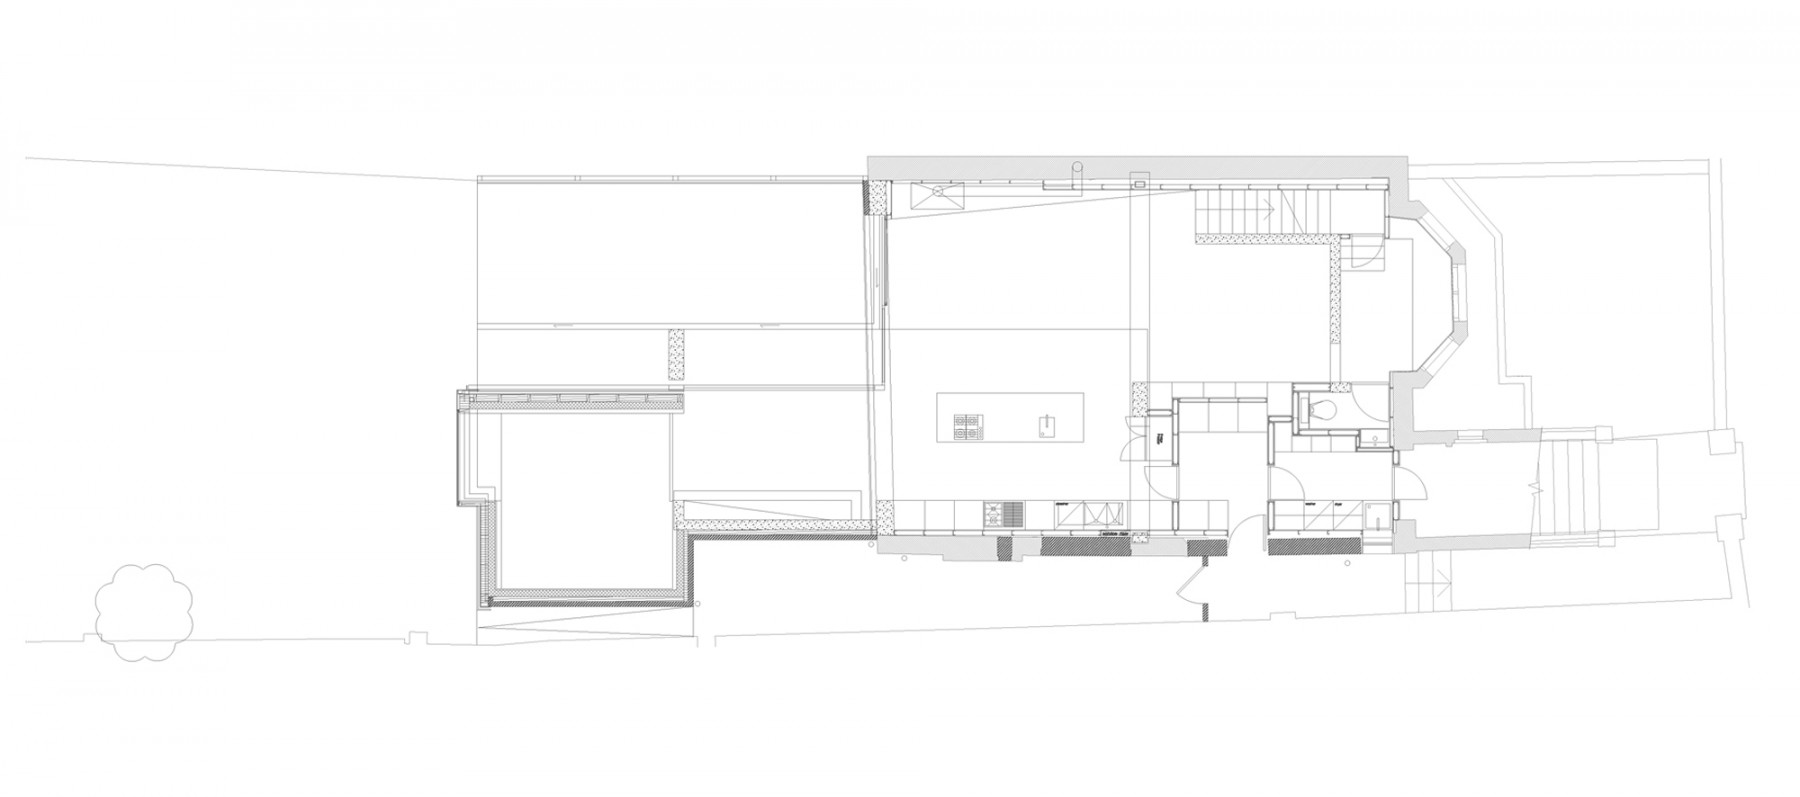 Kander-house-Primrose-hill-London-residential-home-contemporary-interior-Riba-award-victorian-Jamie-Fobert-Architects-plan